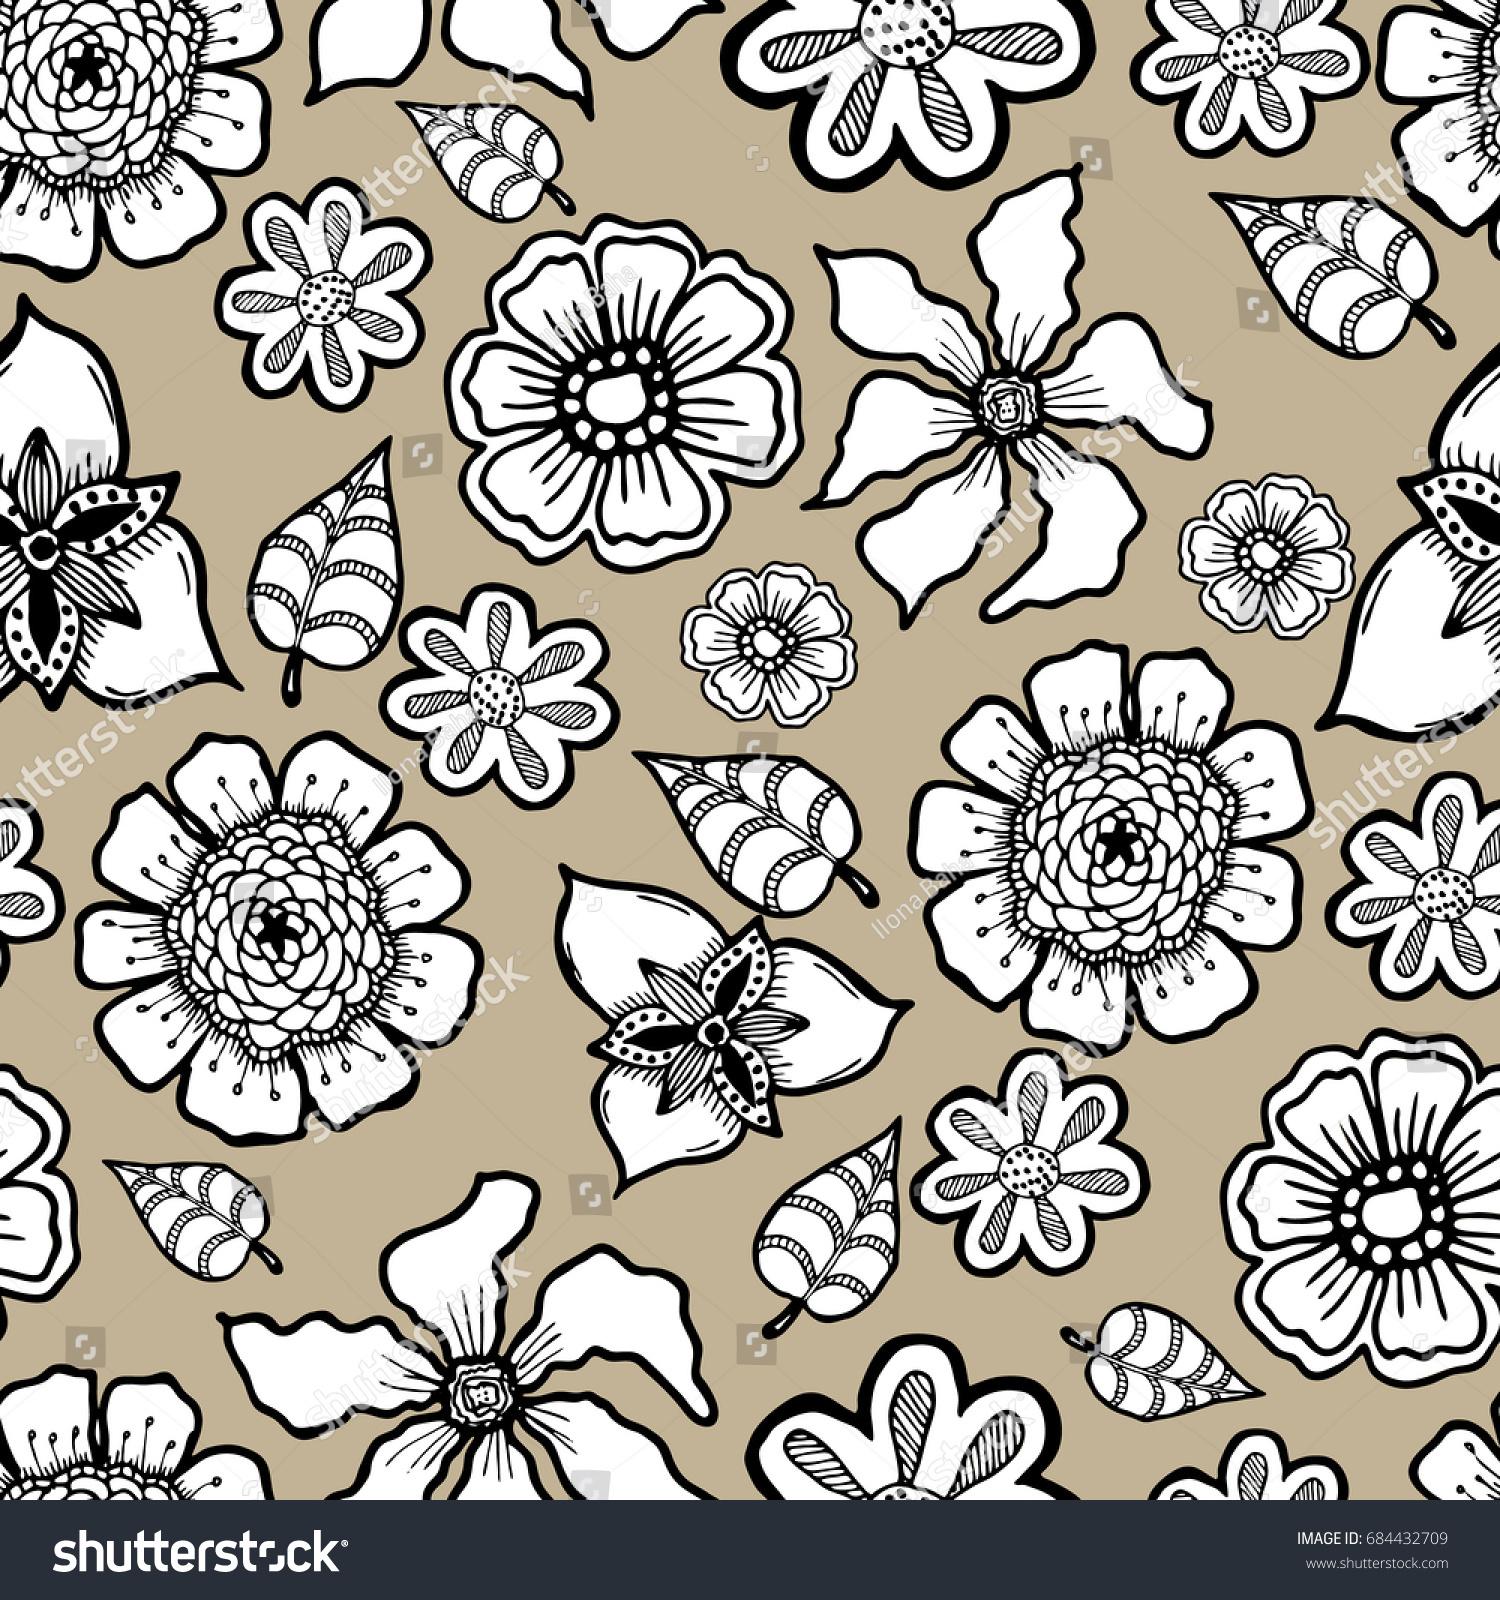 Ornate Floral Pattern Flowers Doodle Sharpie Stock Illustration 1500x1600